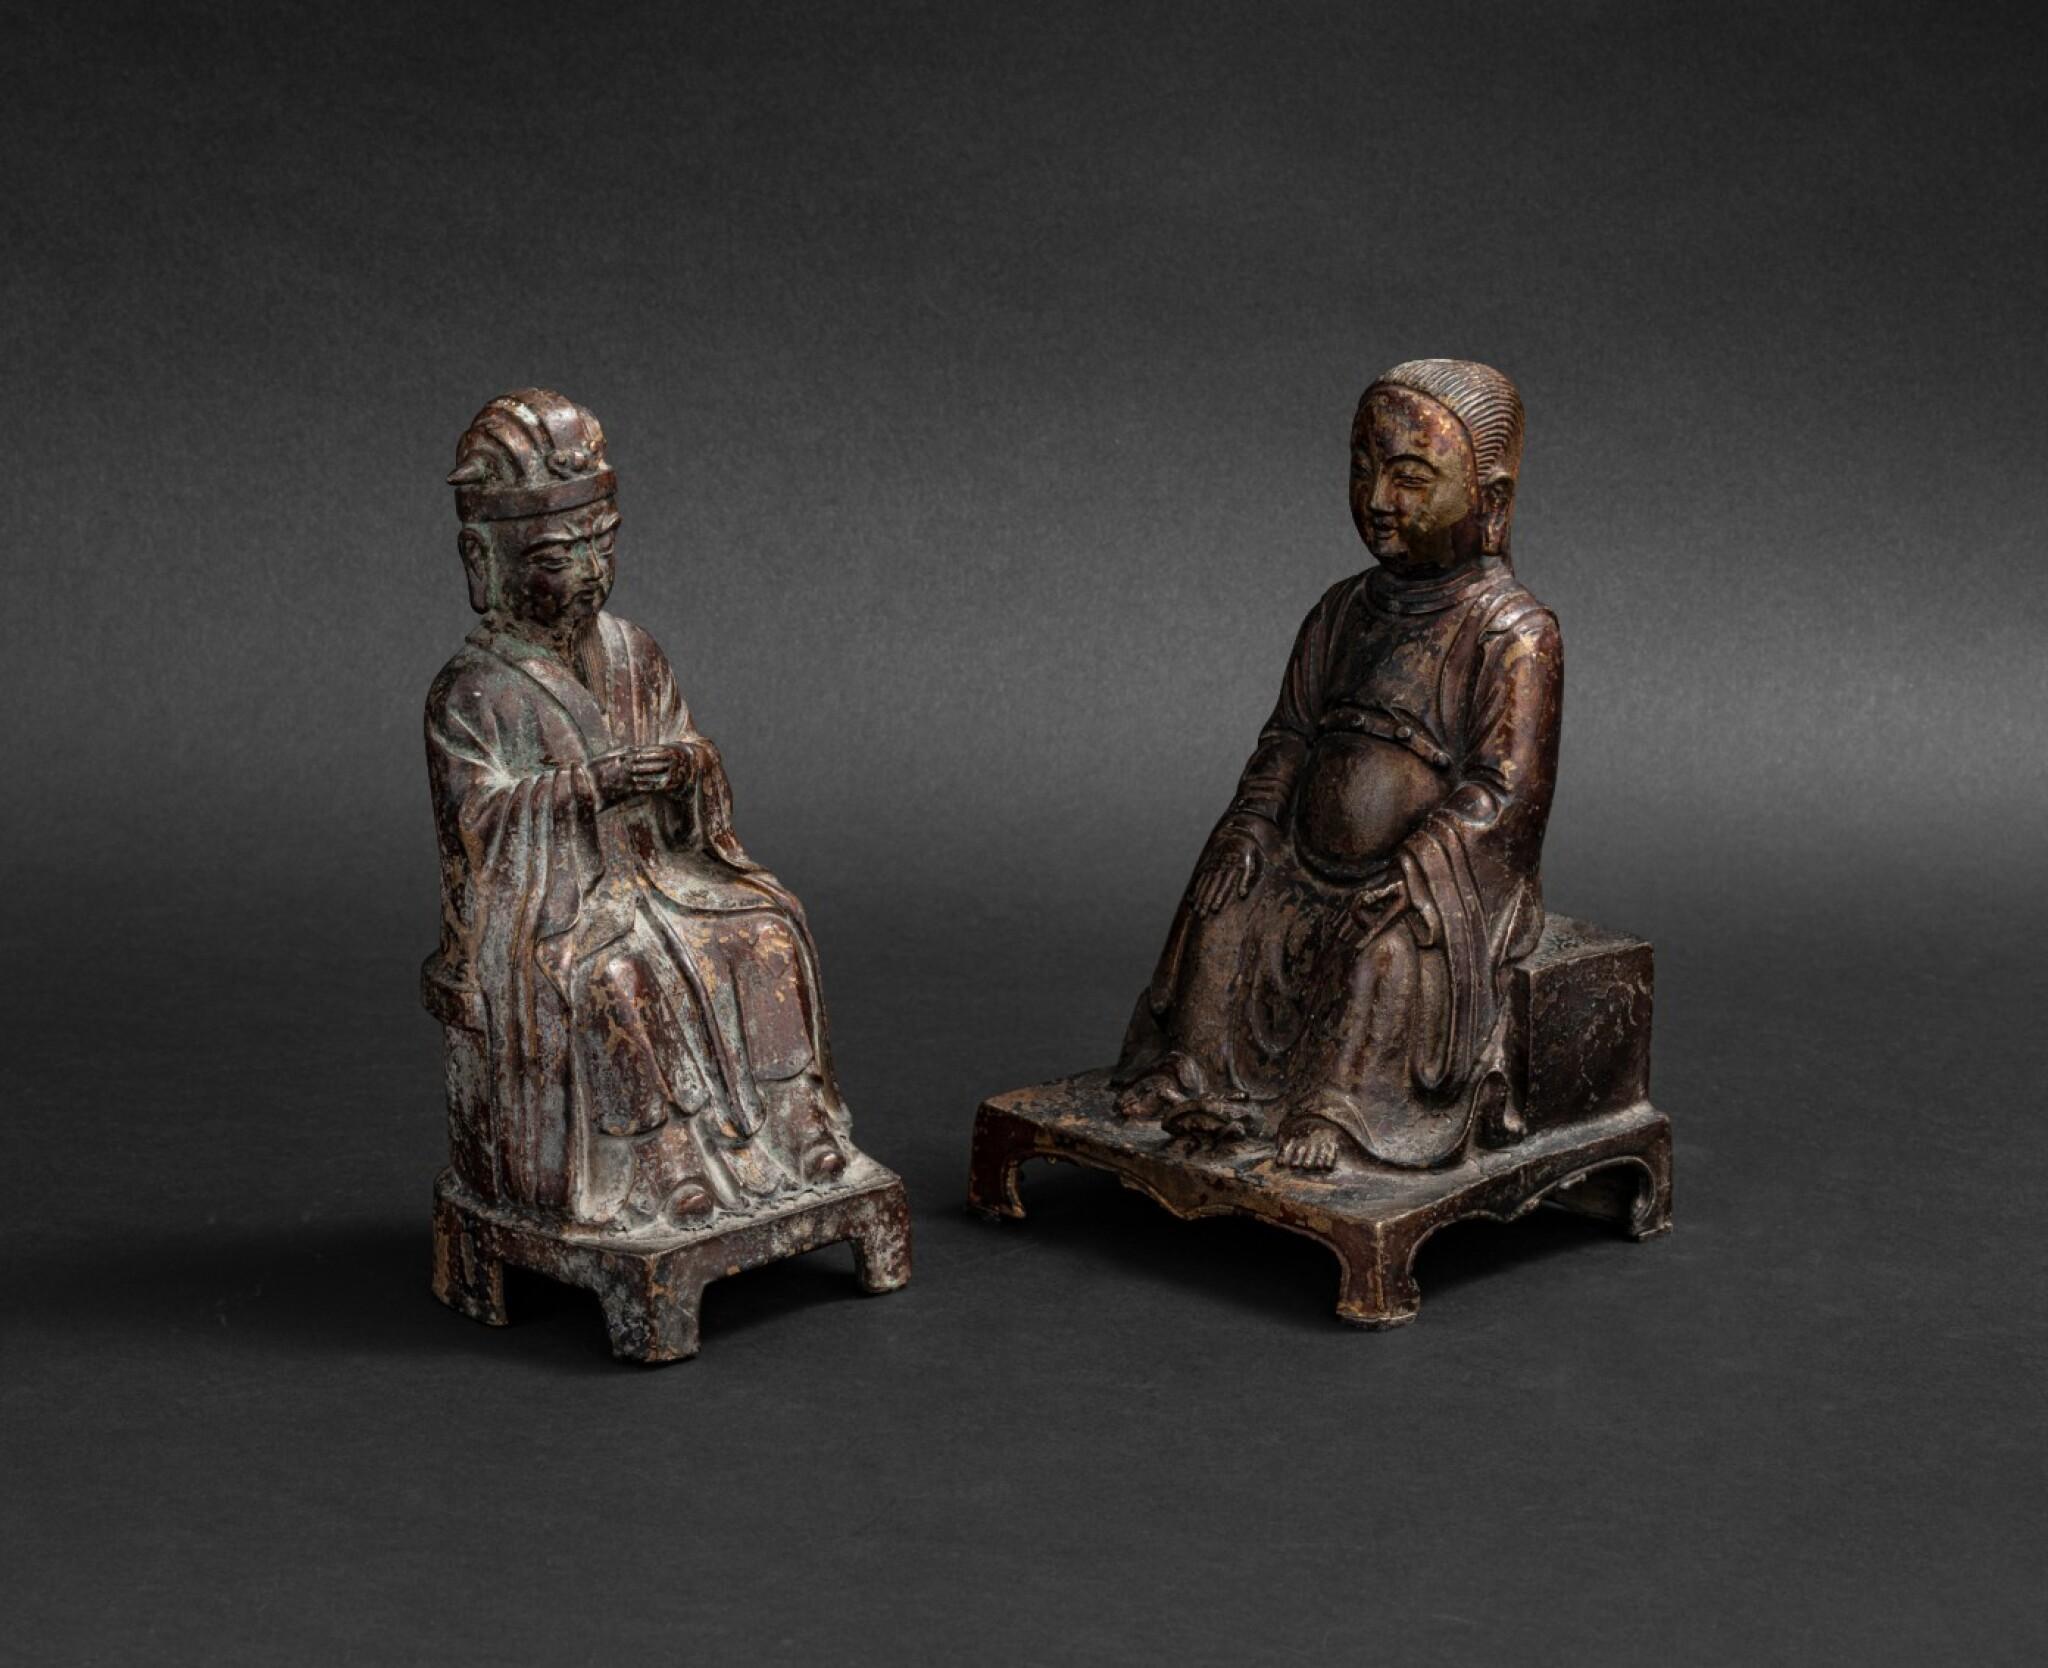 View 1 of Lot 105. Deux figures de dignitaire daoistes en bronze Dynastie Ming - Dynastie Qing | 明至清 銅神仙坐像兩尊 | Two bronze figures of Daoist immortals, Ming - Qing Dynasties.